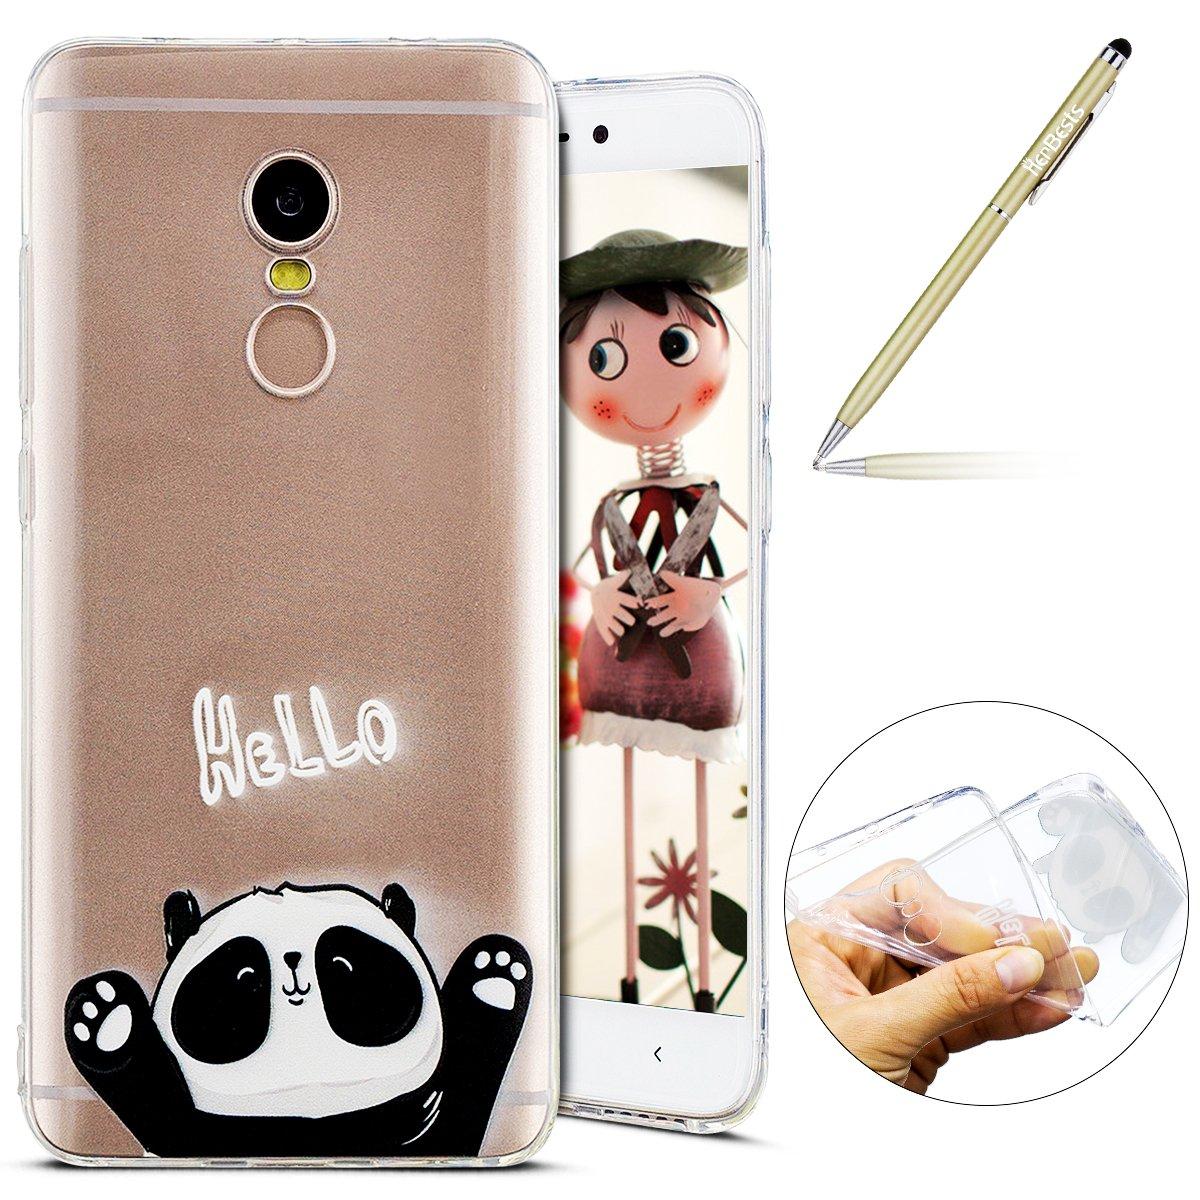 Carcasa para Xiaomi Redmi Note 4, Herbests Funda Xiaomi Redmi Note 4 Silicona Transparente Suave Carcasa con Dibujos de Colores…